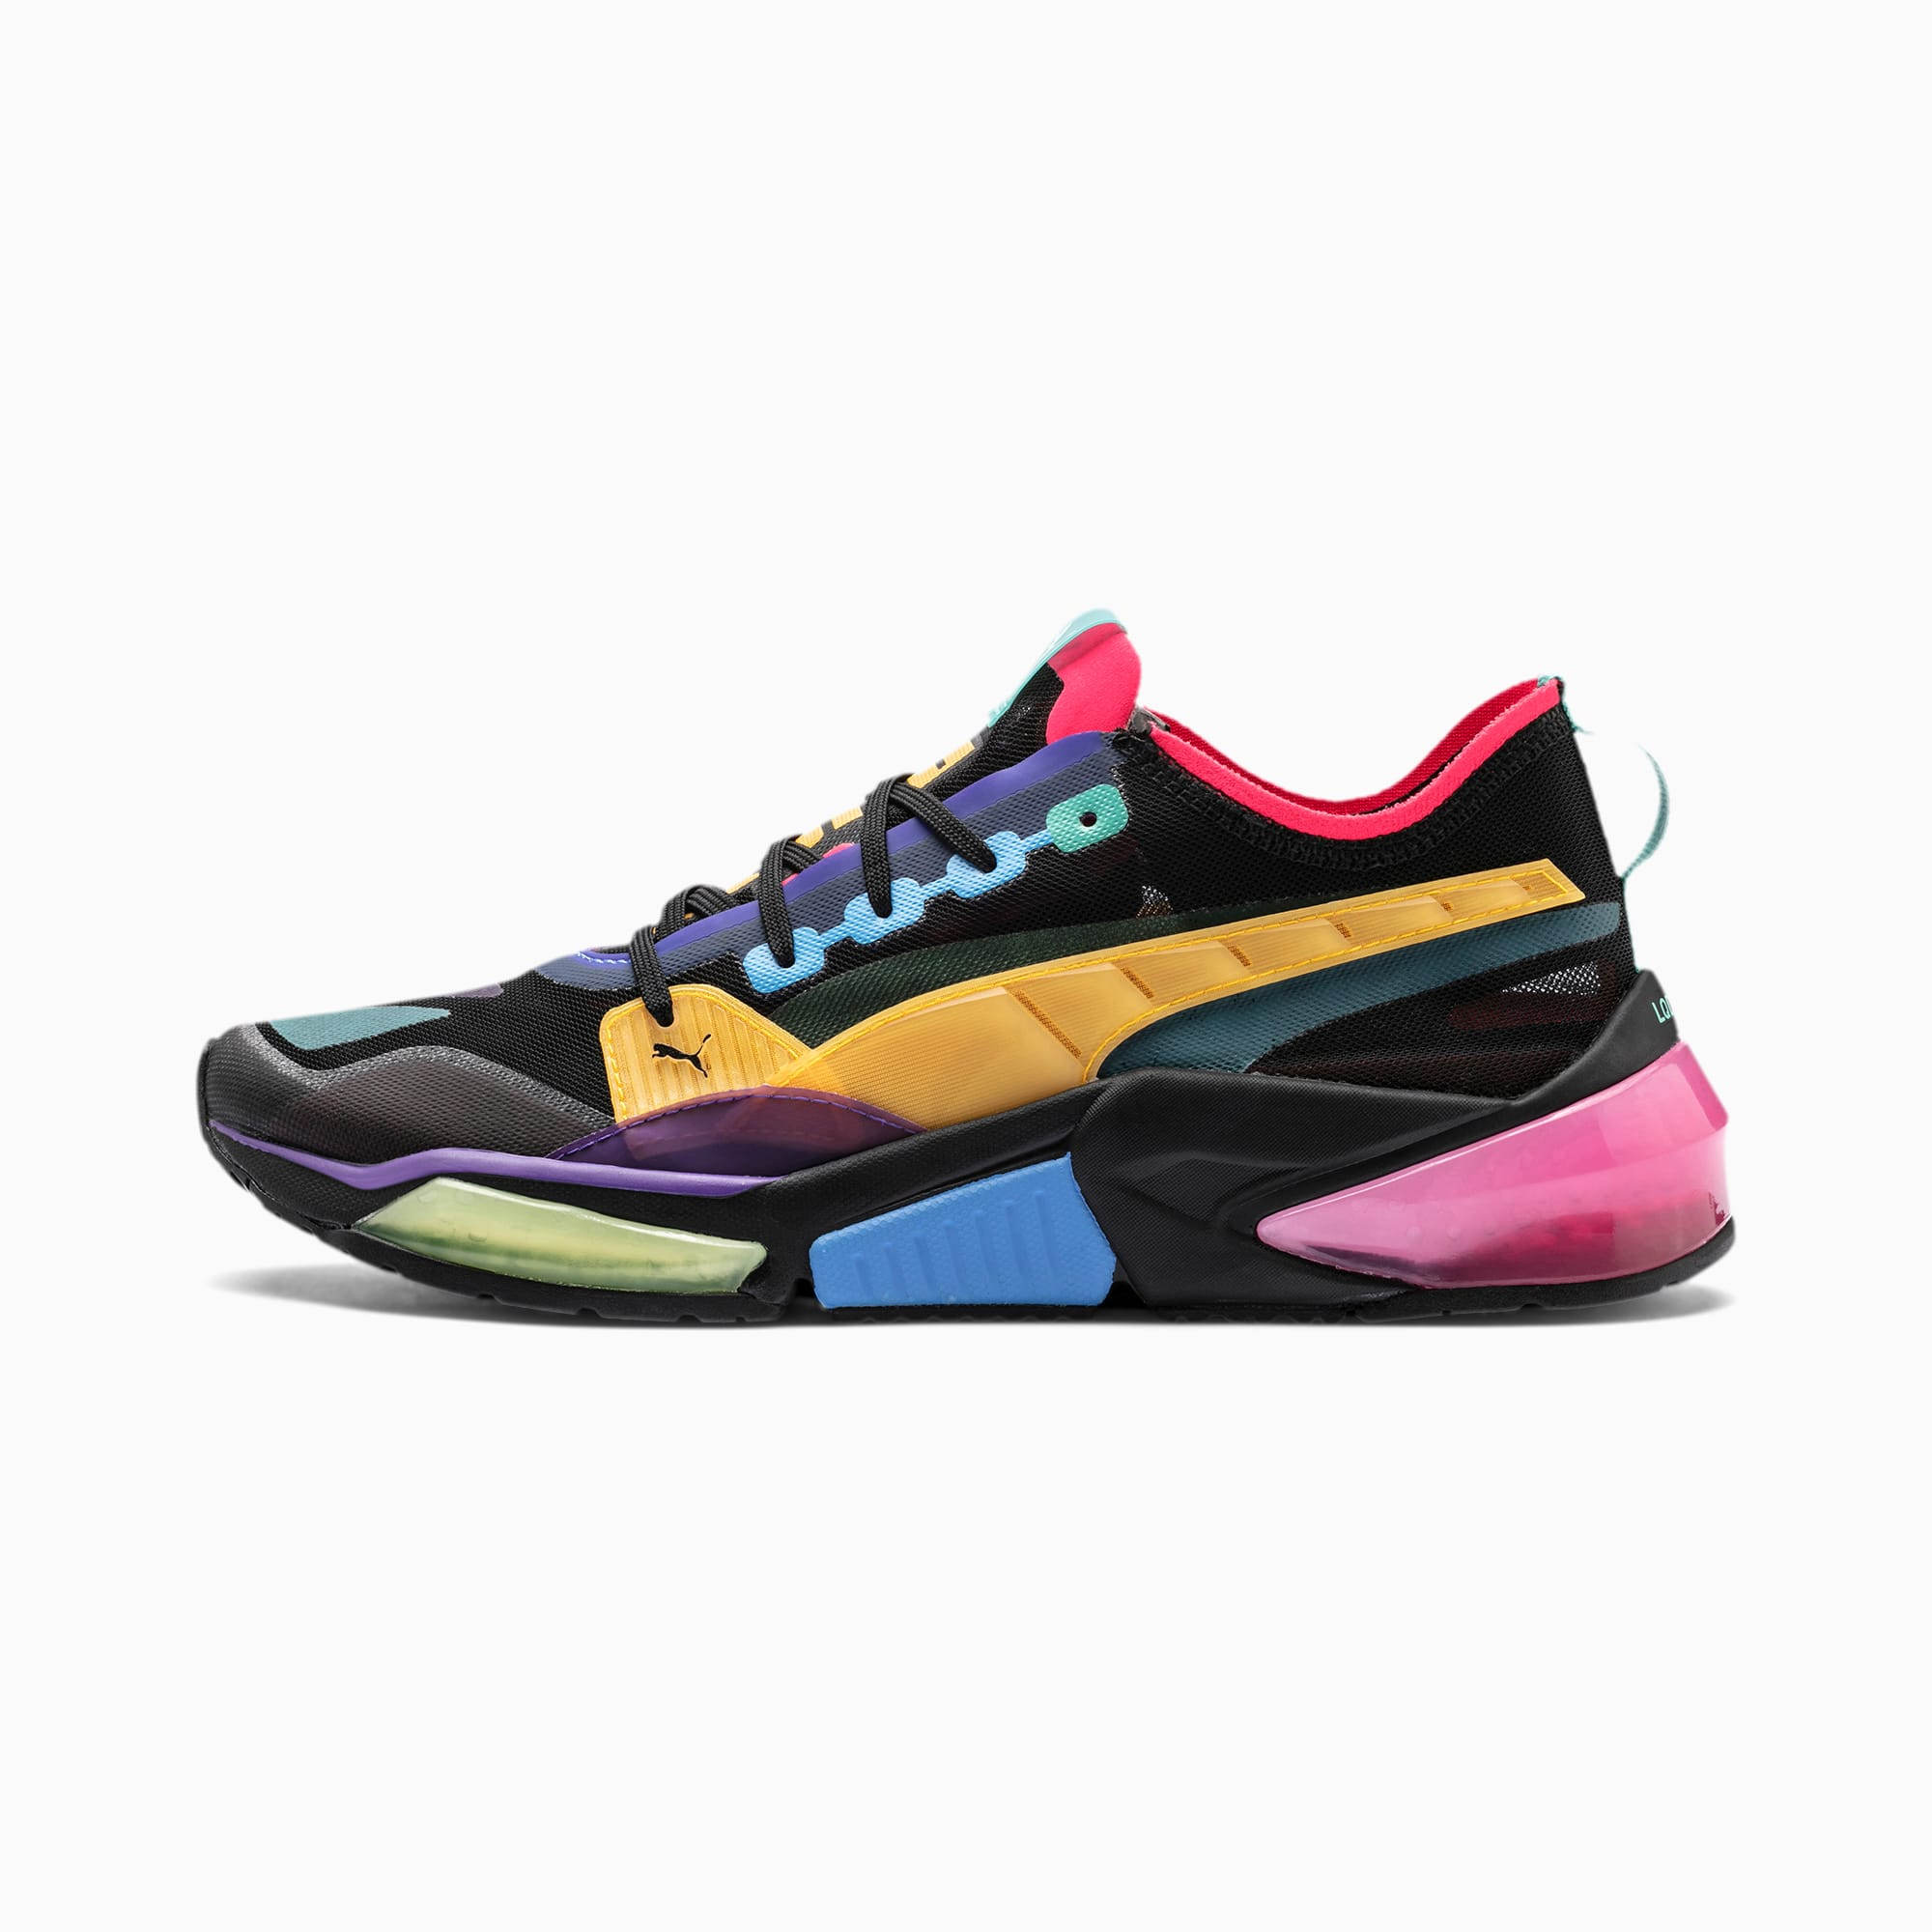 LQDCELL Optic Sheer Men's Training Shoes | PUMA US